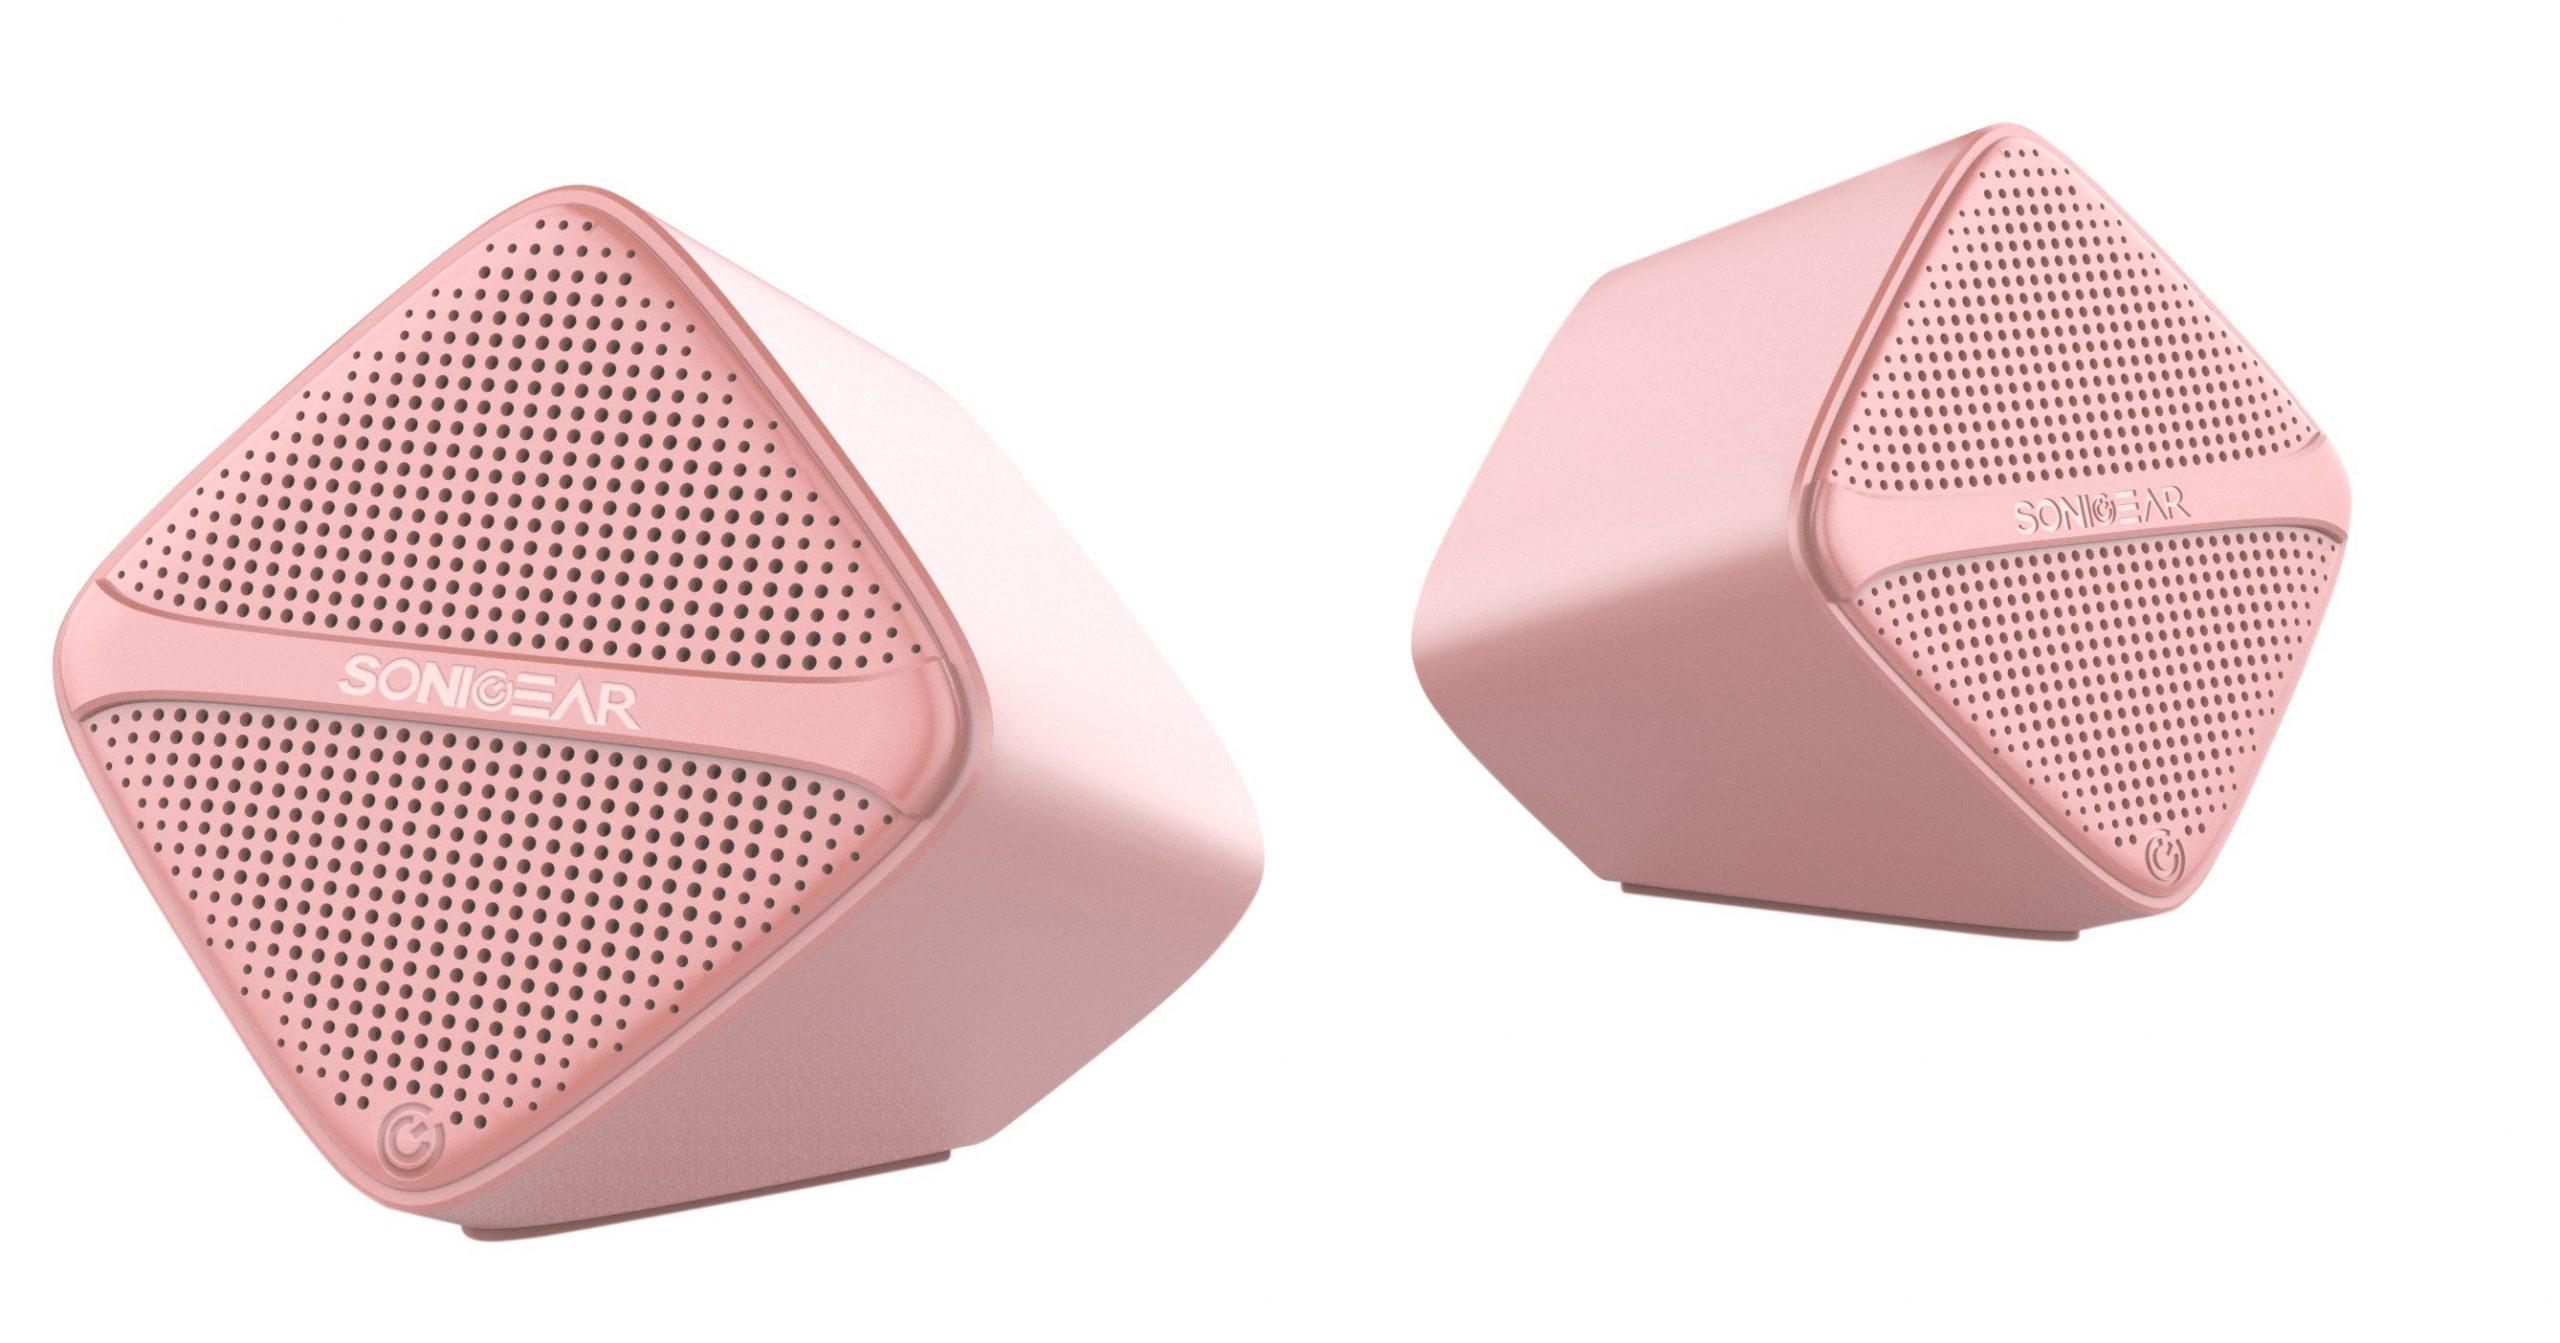 SonicGear SonicCube 2.0 USB PC Speakers Peach 12W